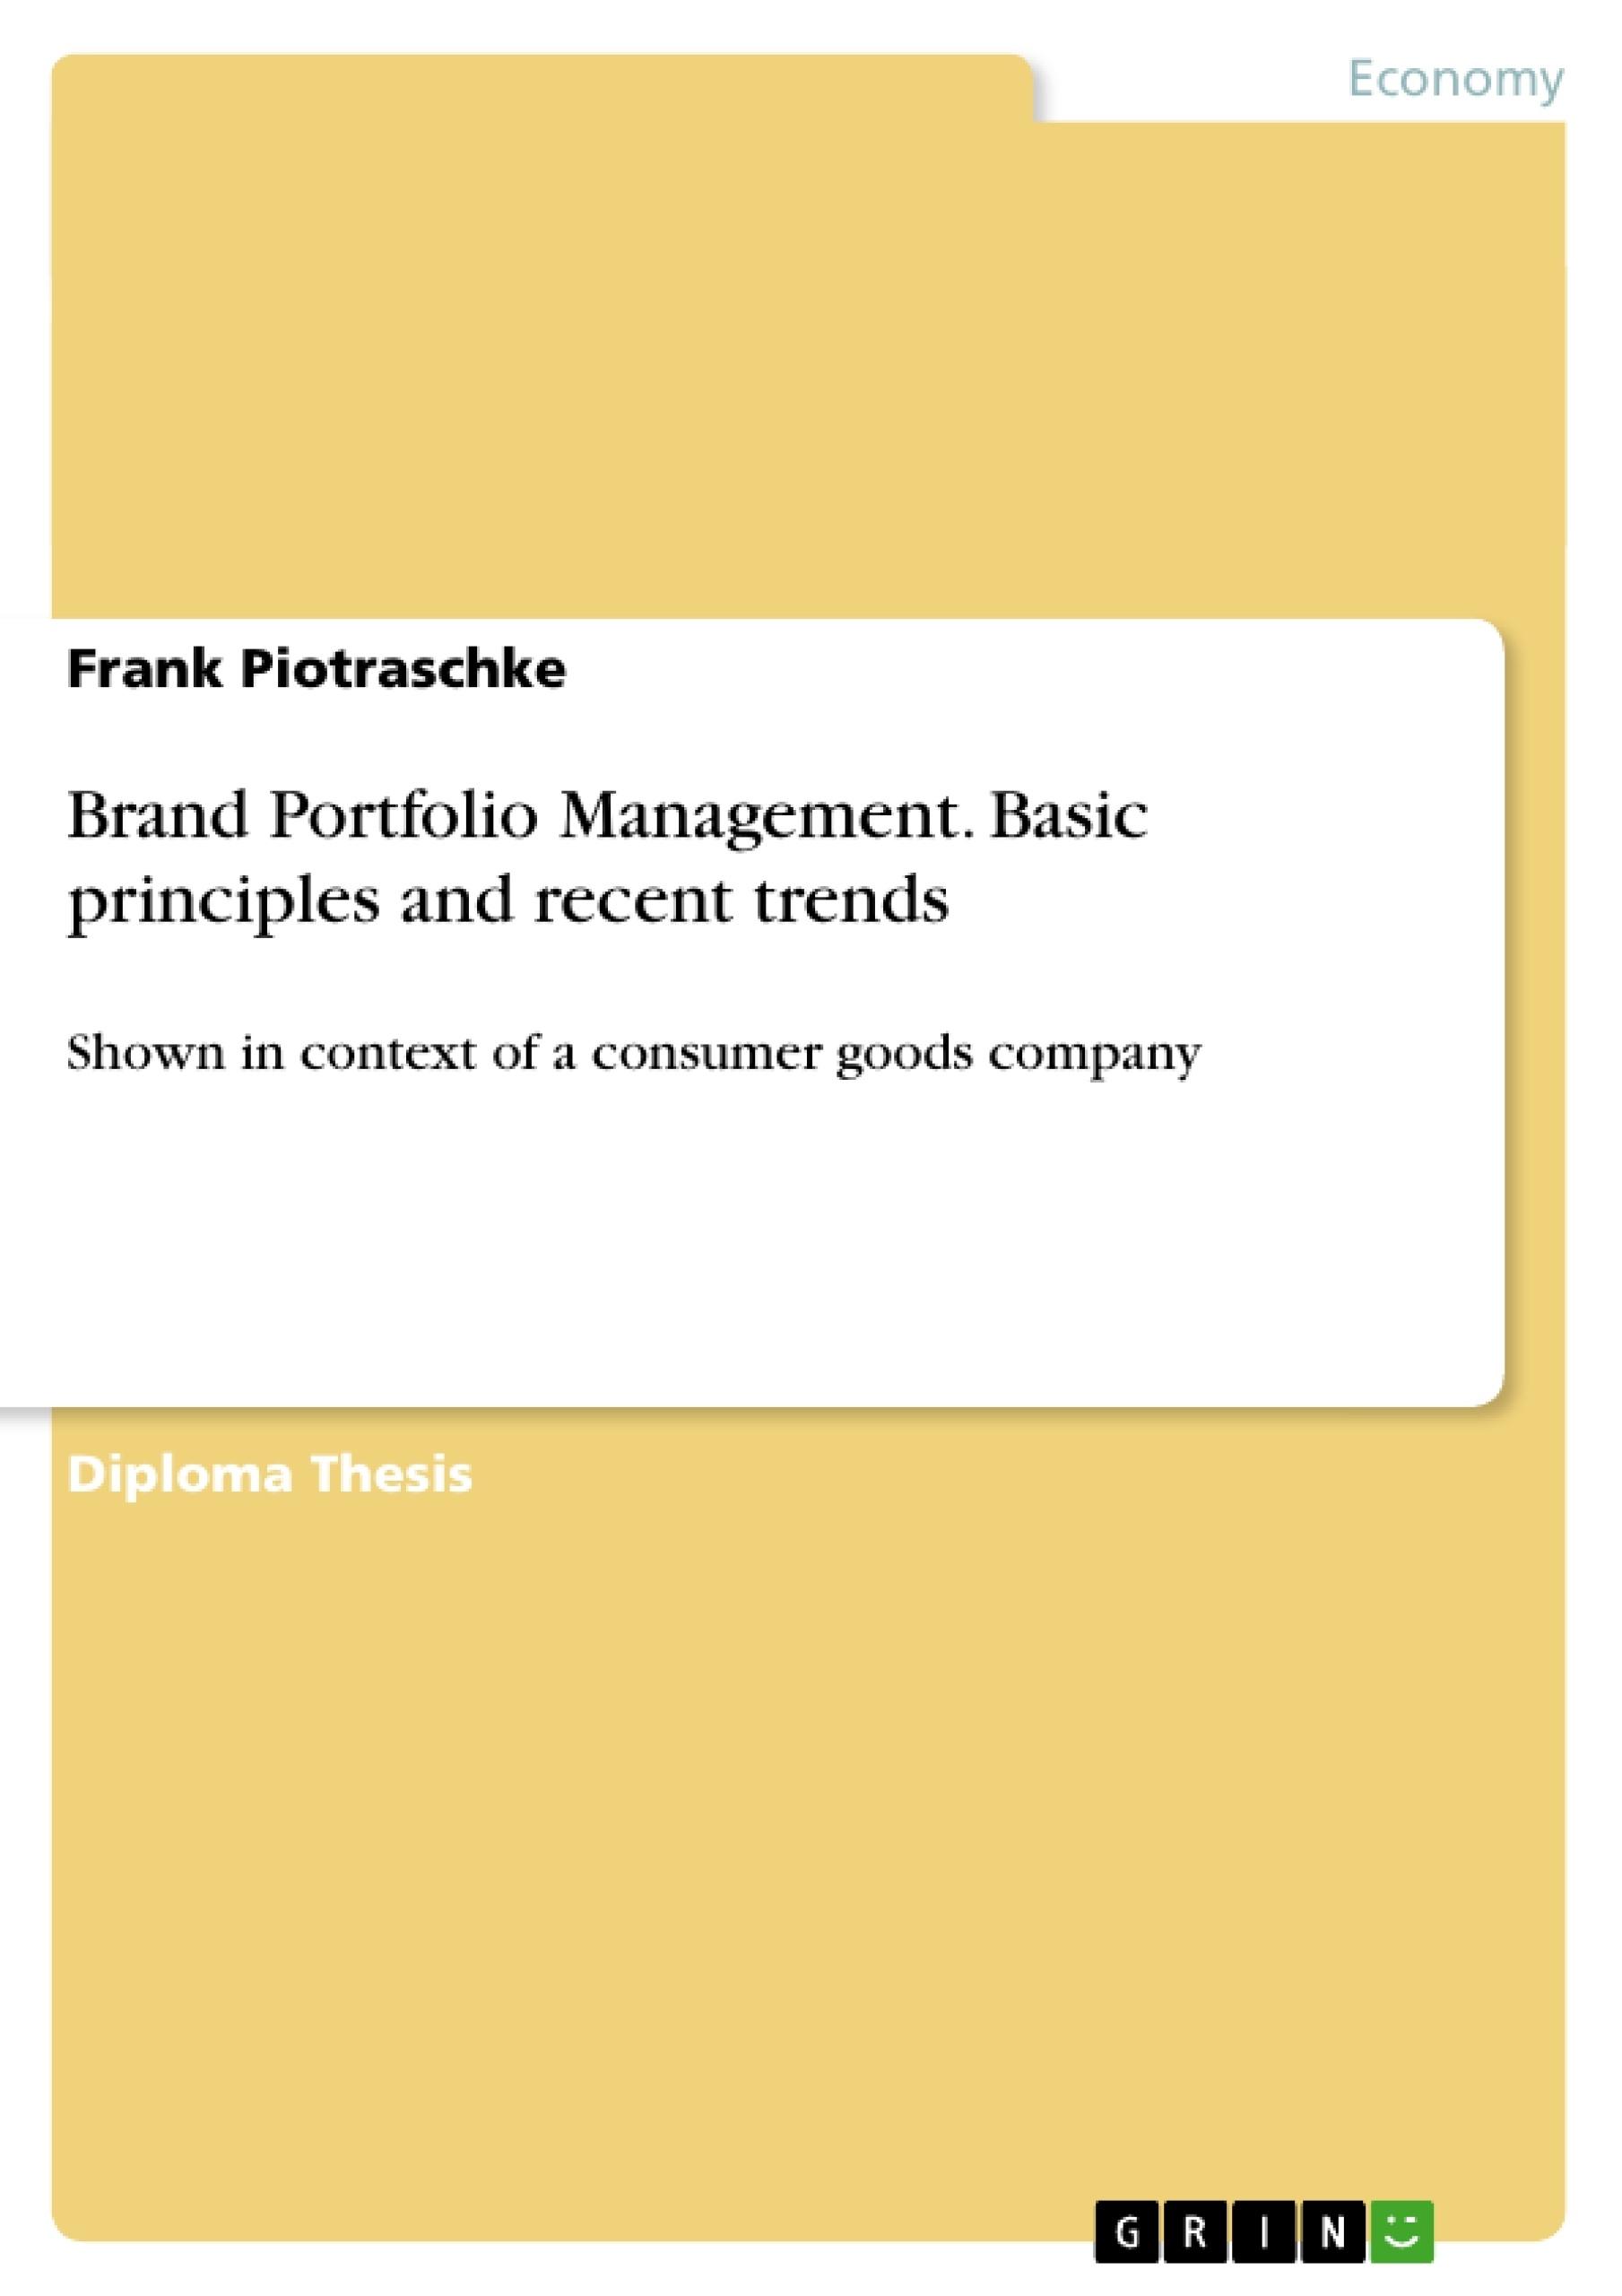 Title: Brand Portfolio Management.  Basic principles and recent trends